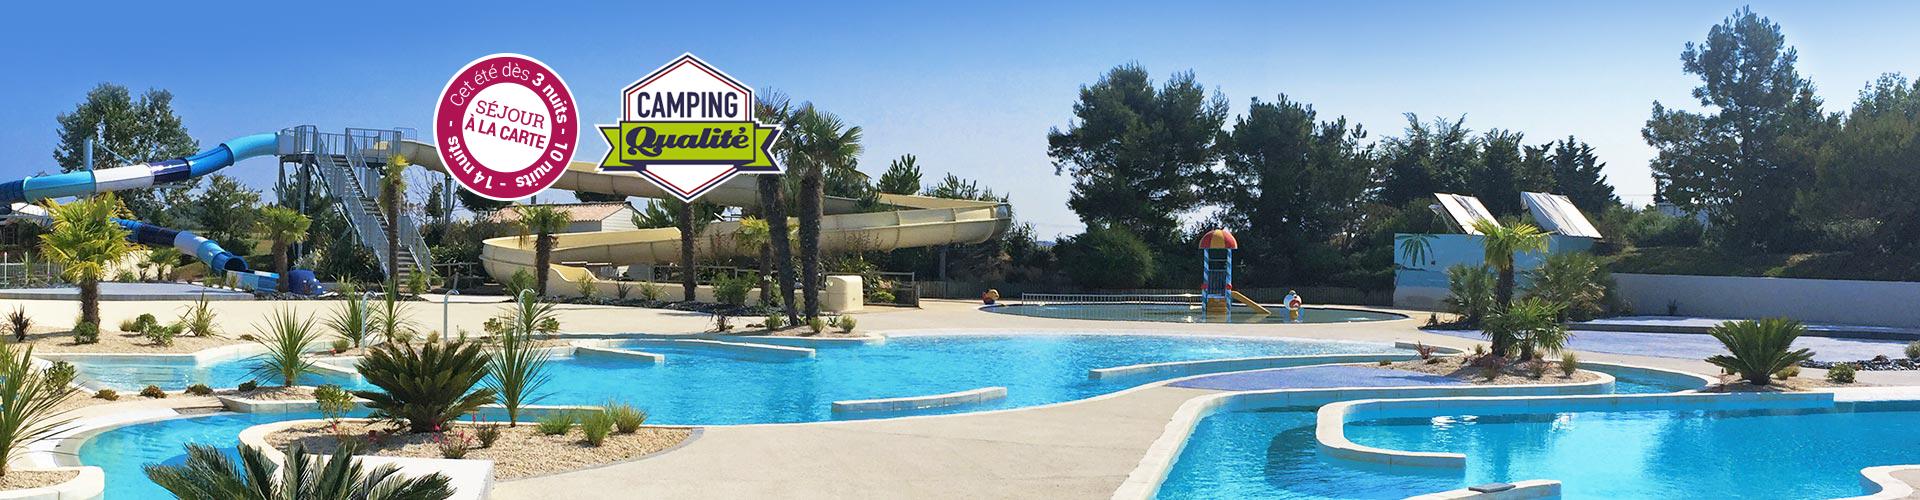 Camping La Tranche Sur Mer Camping Vendée Étoiles Les Blancs - Camping la tranche sur mer avec piscine